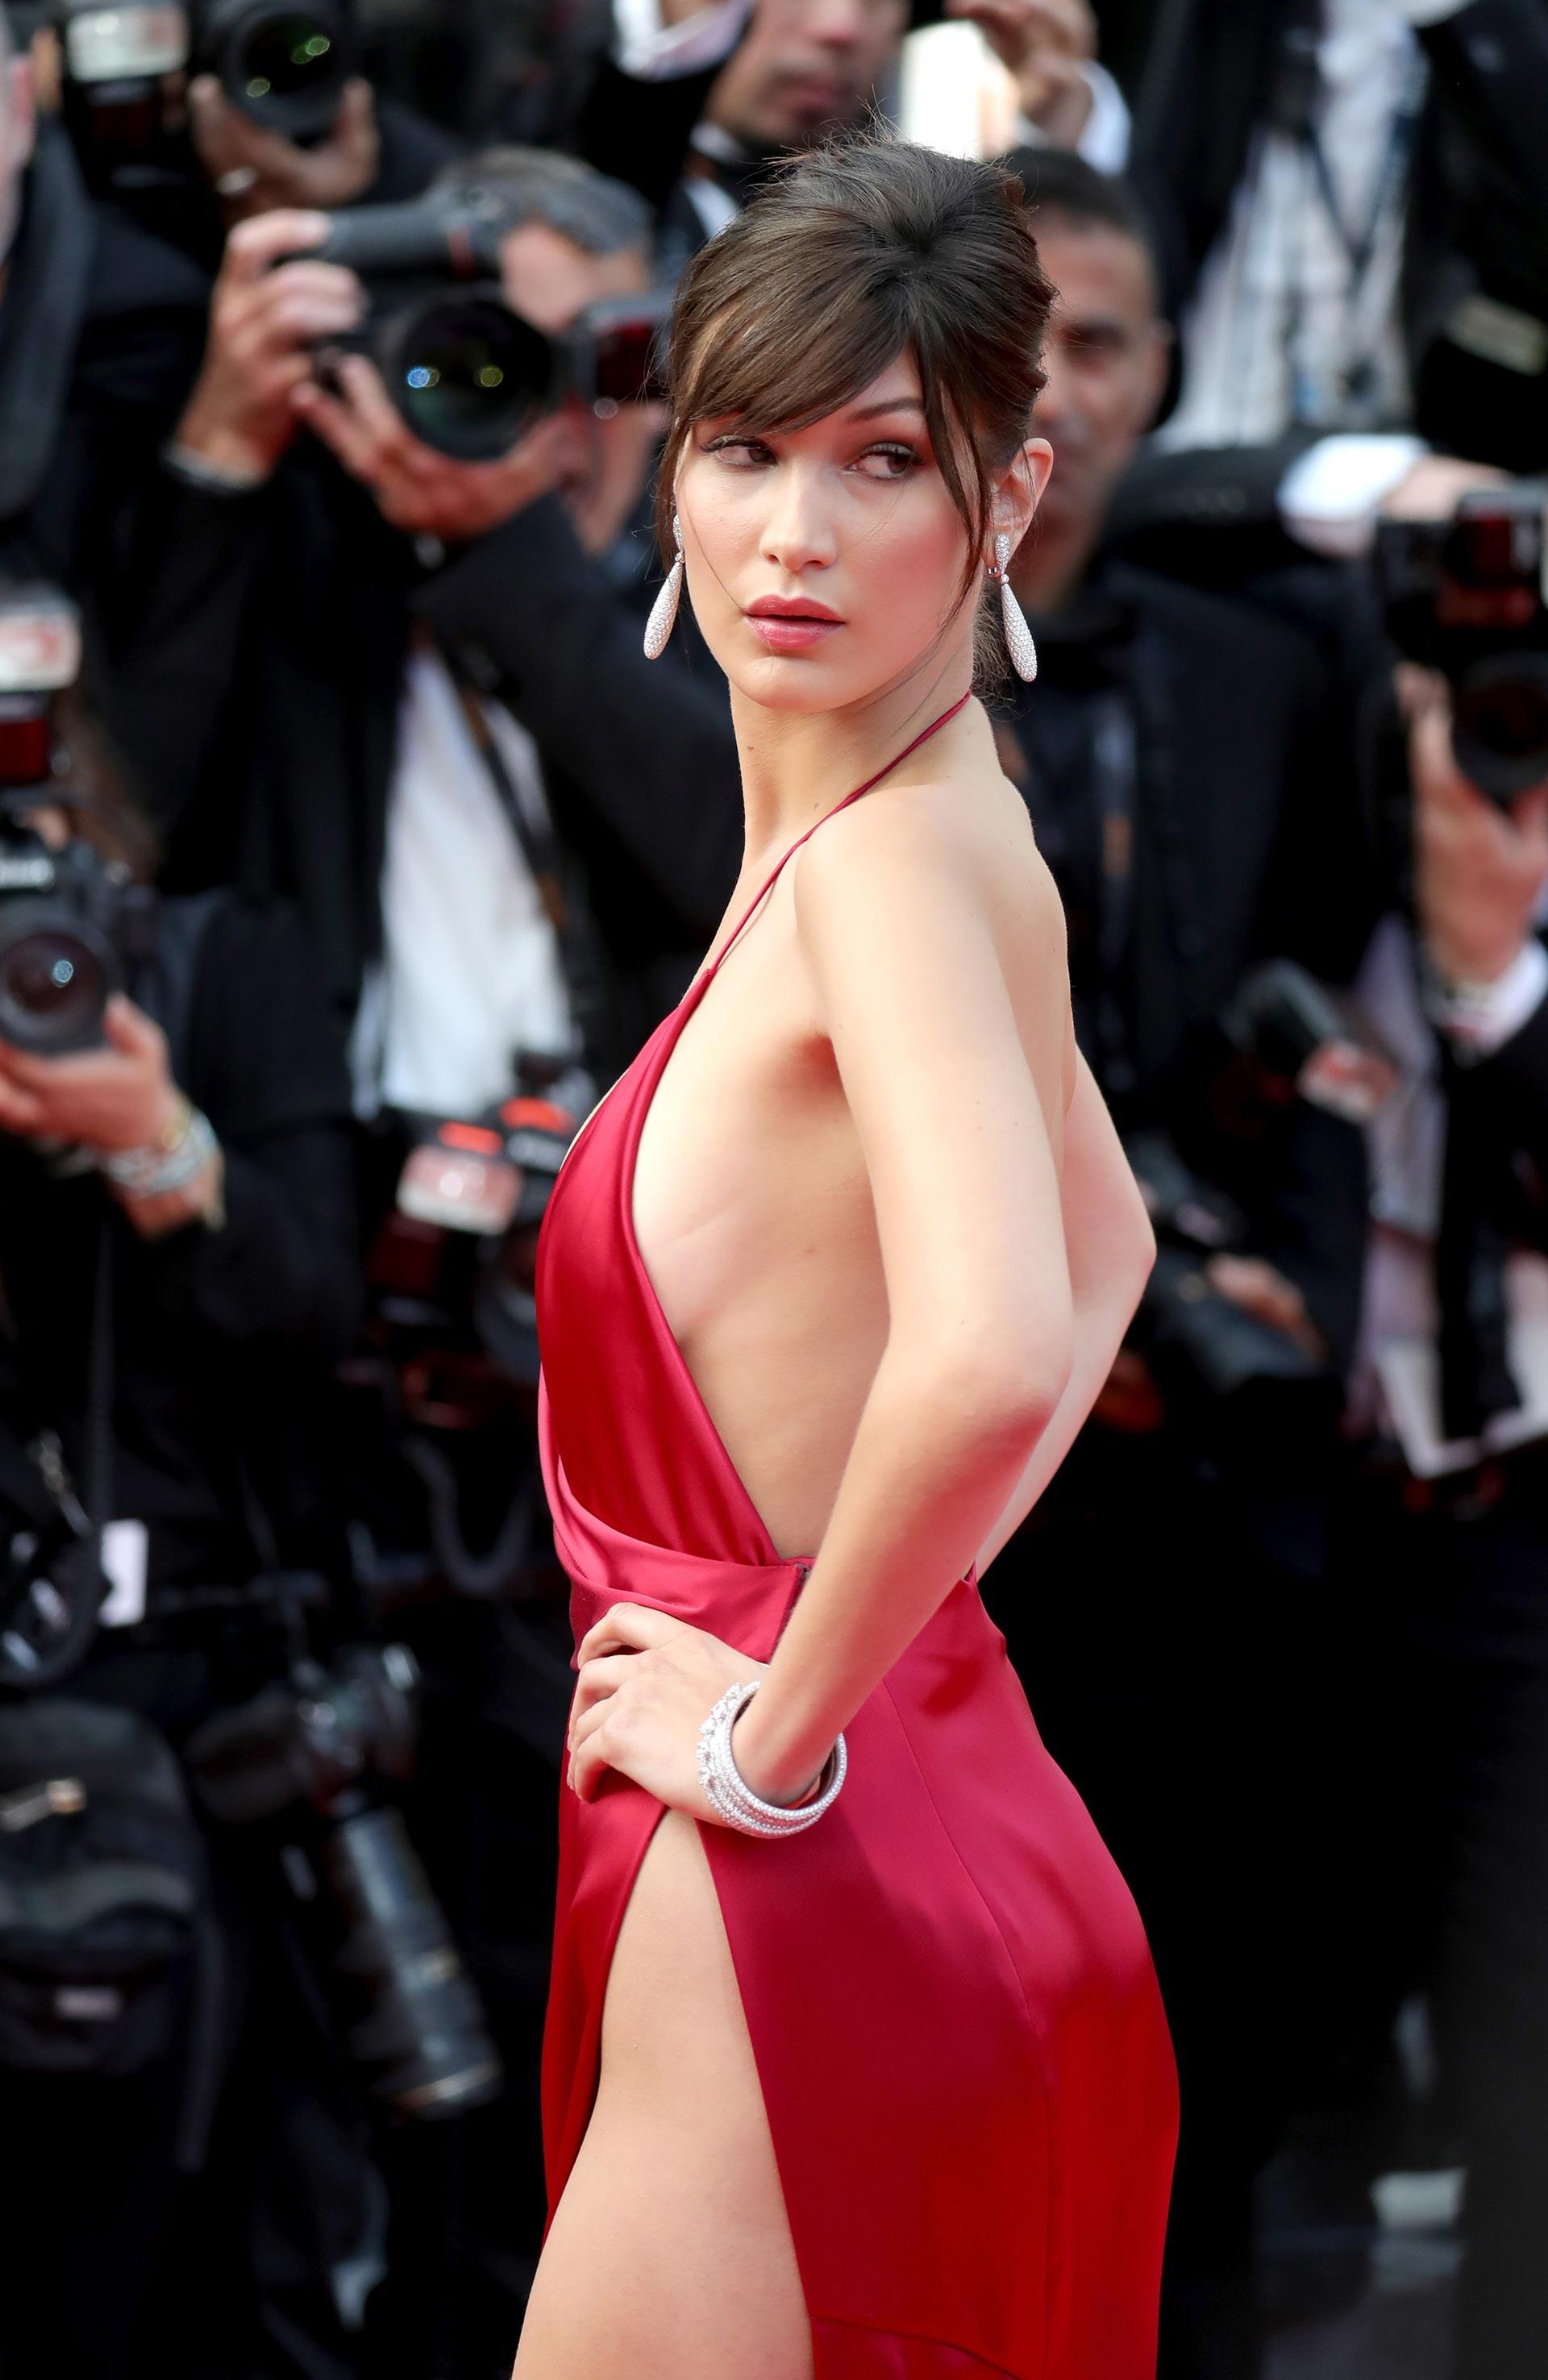 Bella Hadid en Cannes 2016 (Getty Images)